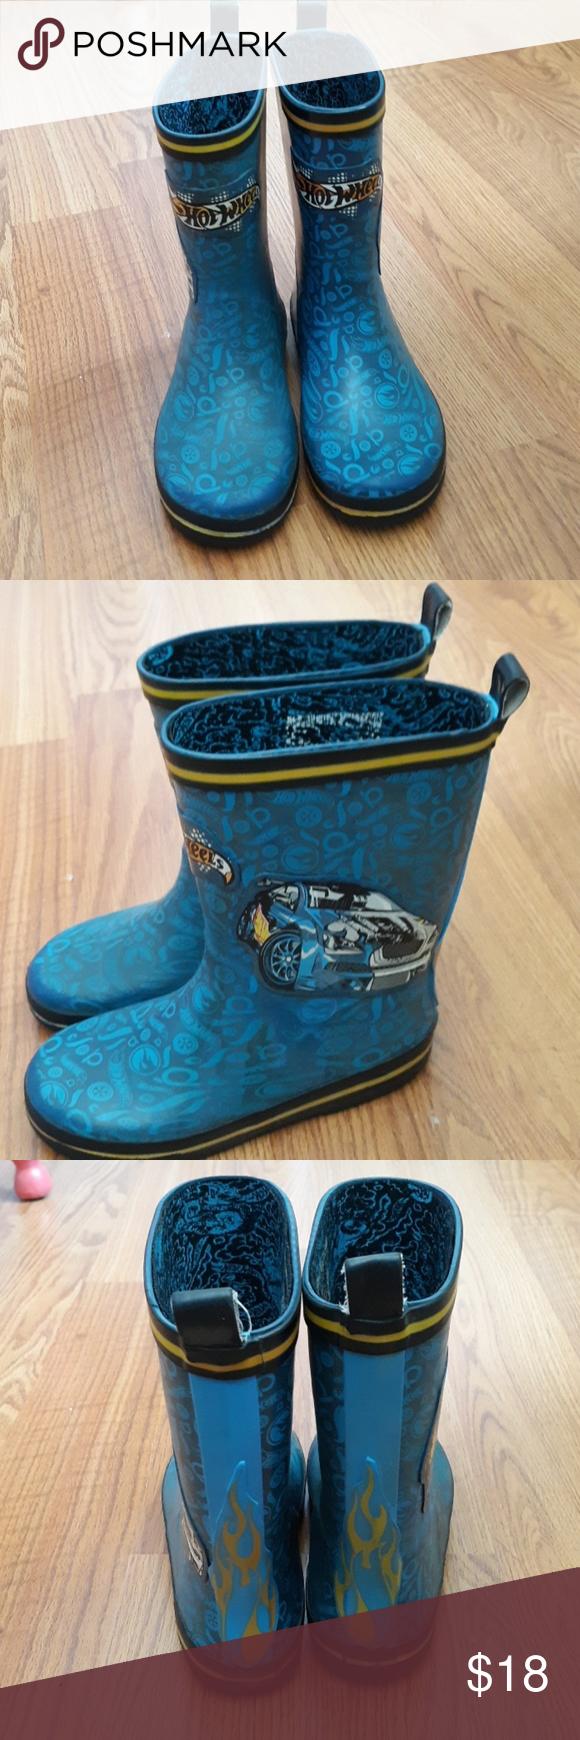 Hot Wheels Boys Rubber Rain Boots Size 12 Rubber Rain Boots Boots Rain Boots